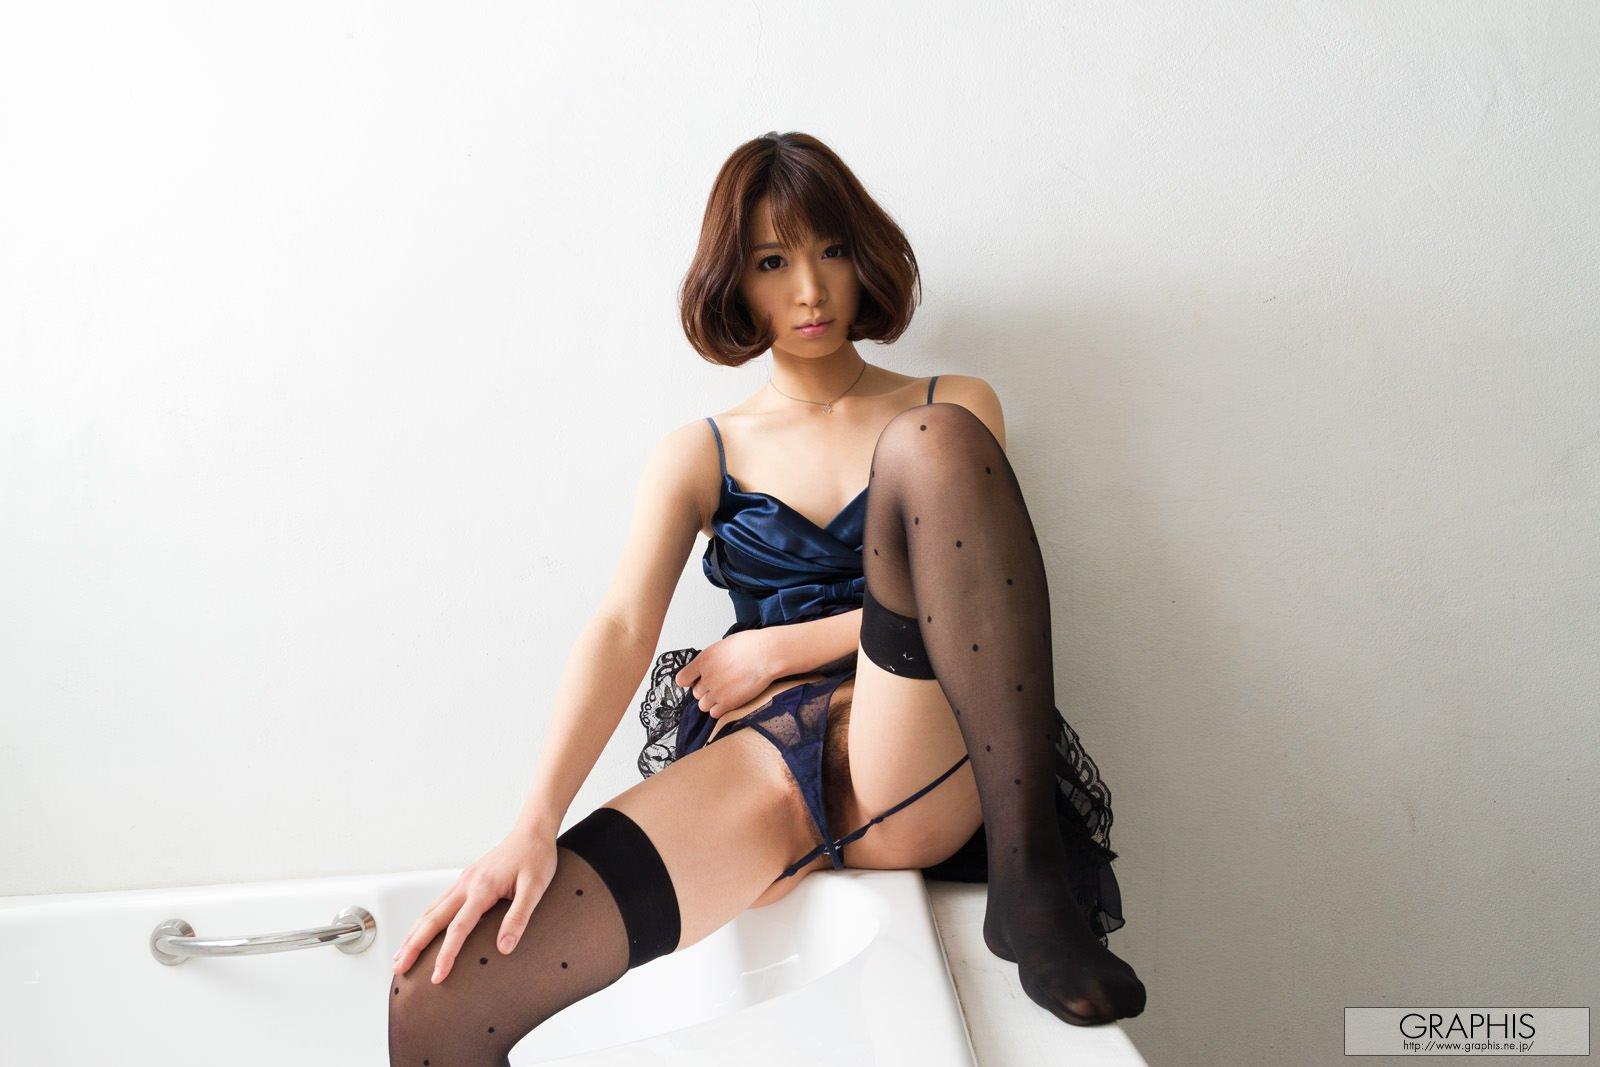 mayu-kamiya-bathroom-black-stockings-asian-naked-graphis-06